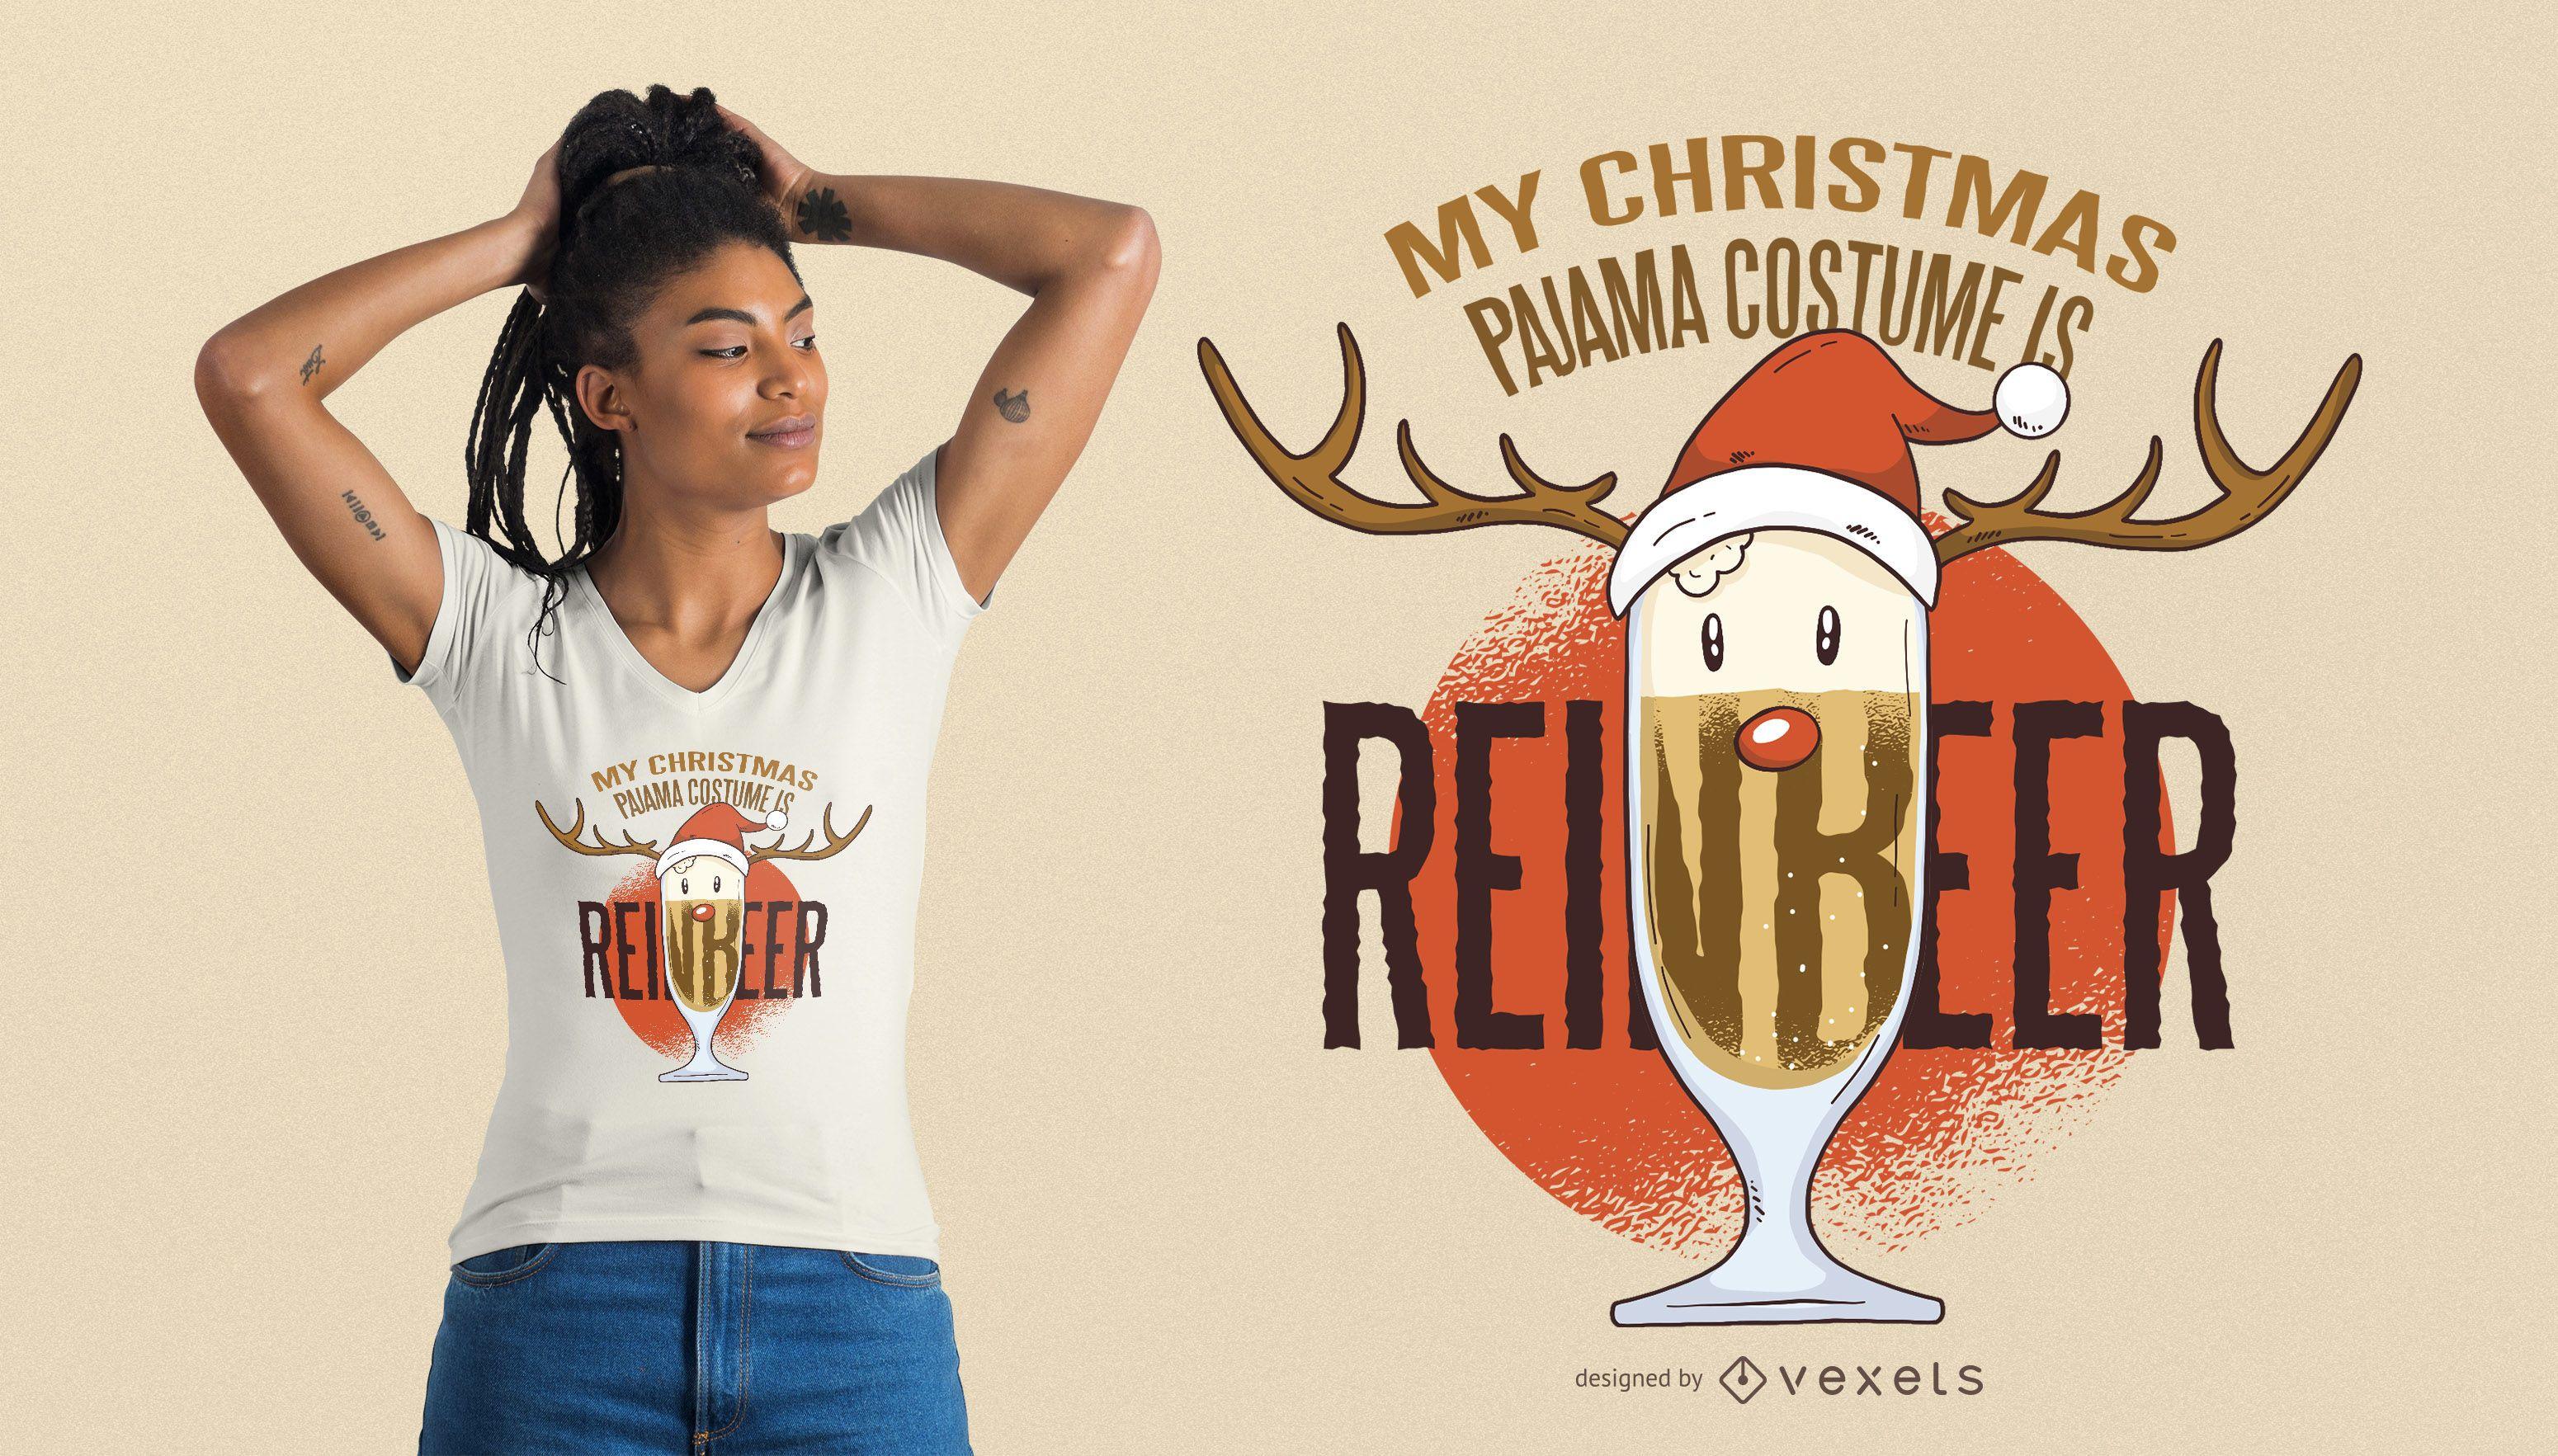 Dise?o de camiseta de Navidad Reinbeer